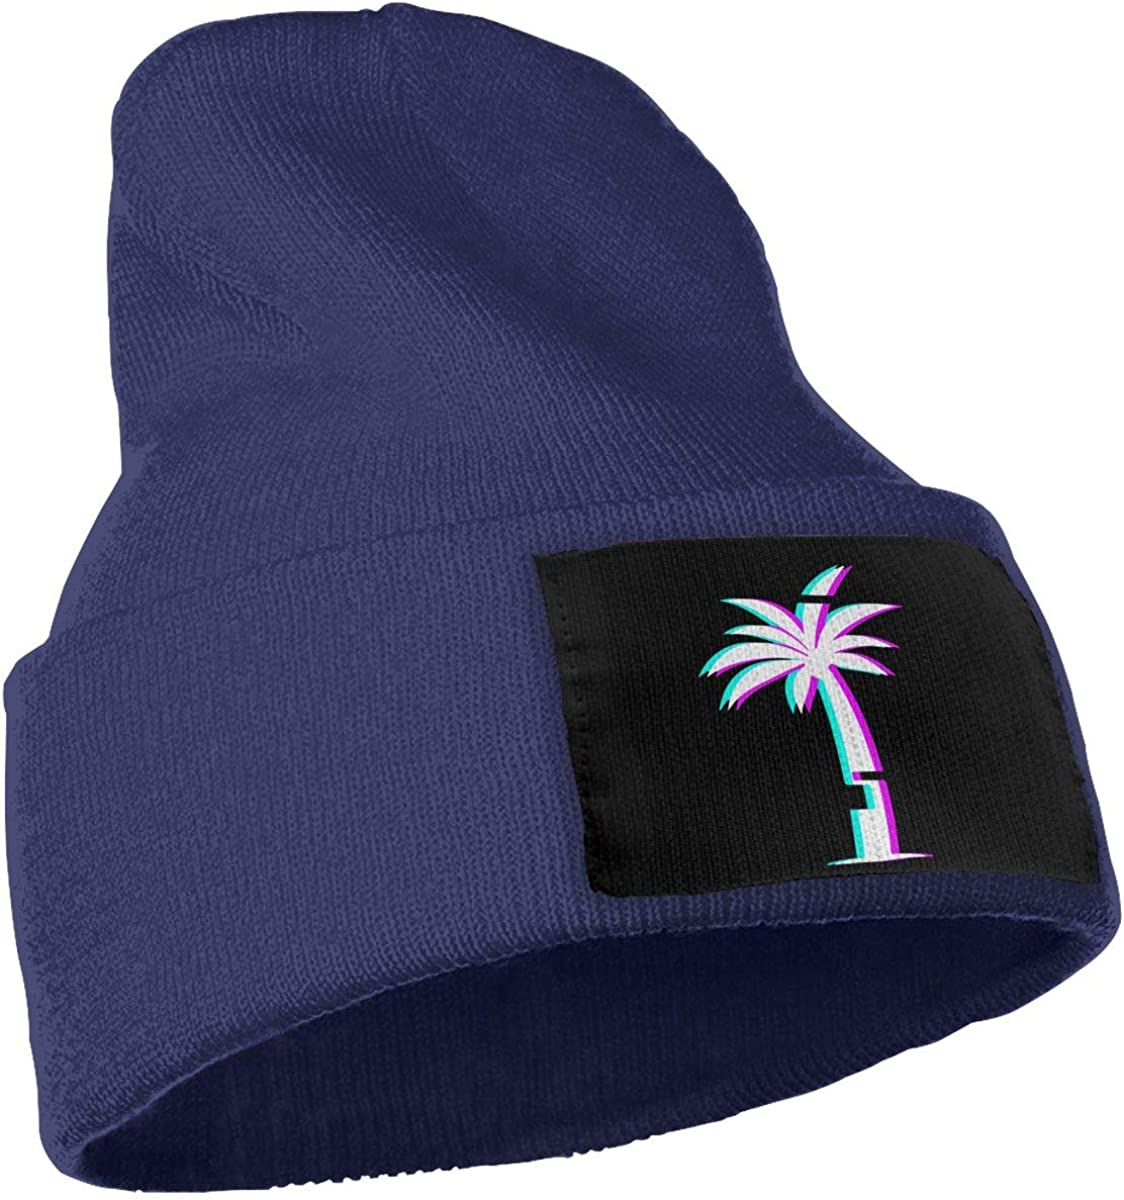 Peng Peng Glitch Aesthetic Vaporwave Palm Tree Beanie Cap Skull Cap Men Women Winter Warm Knitting Hats